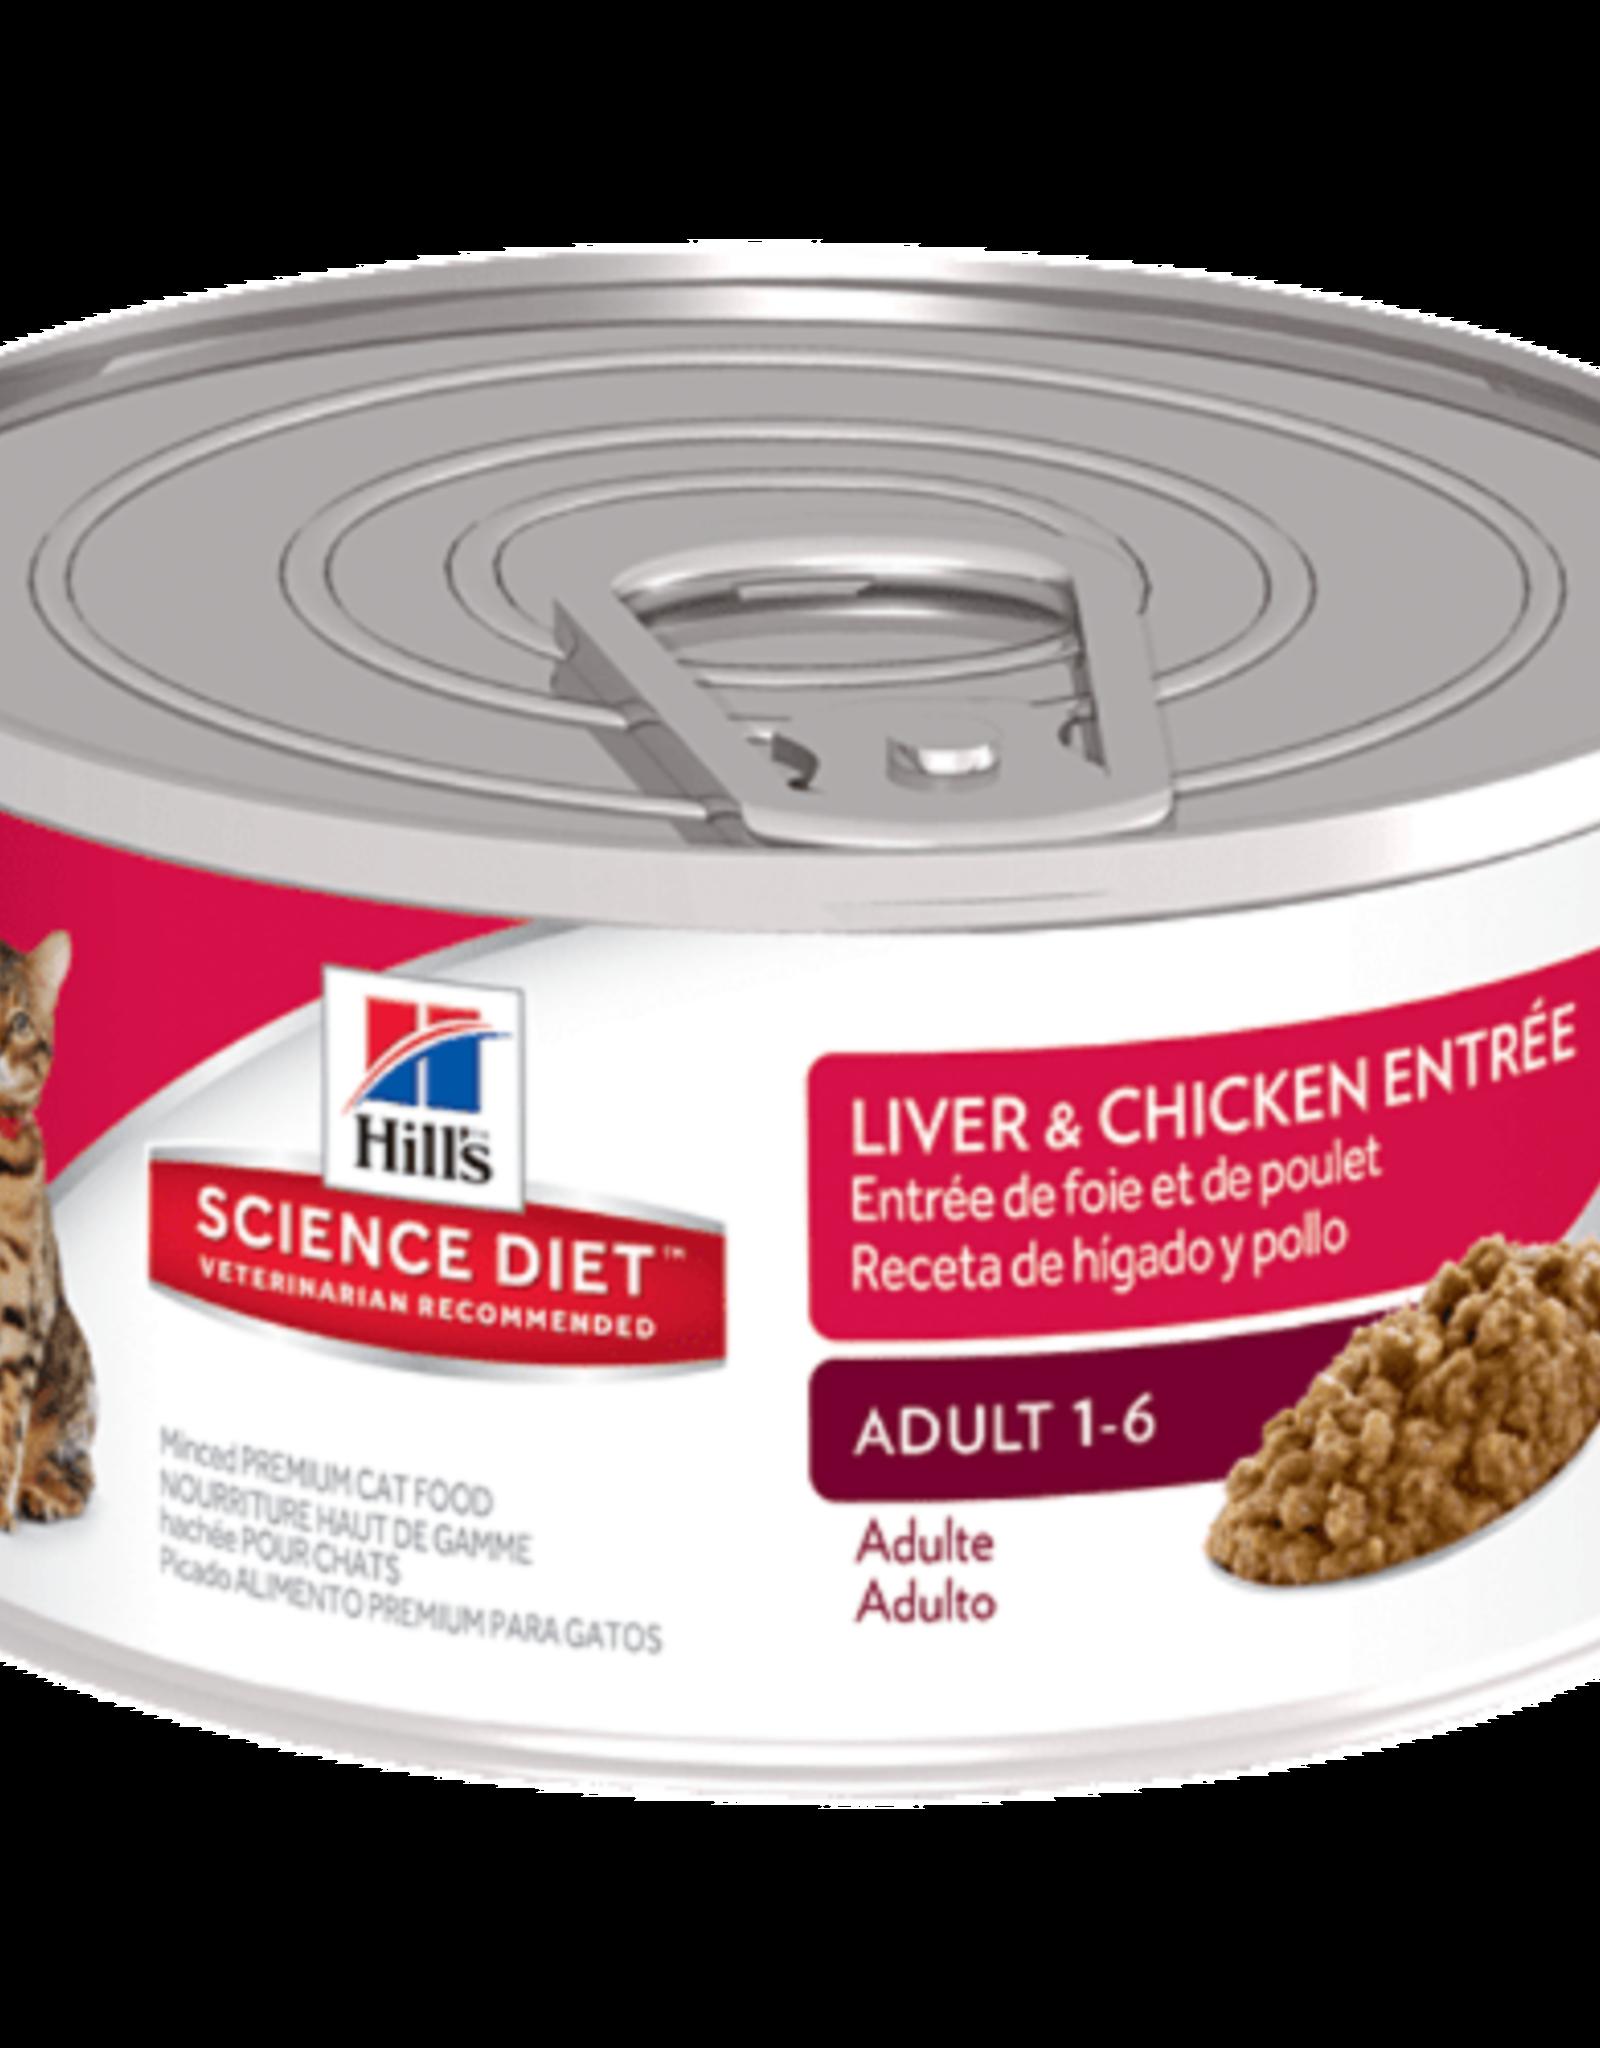 SCIENCE DIET HILL'S SCIENCE DIET FELINE CAN ADULT LIVER & CHICKEN 5.5OZ